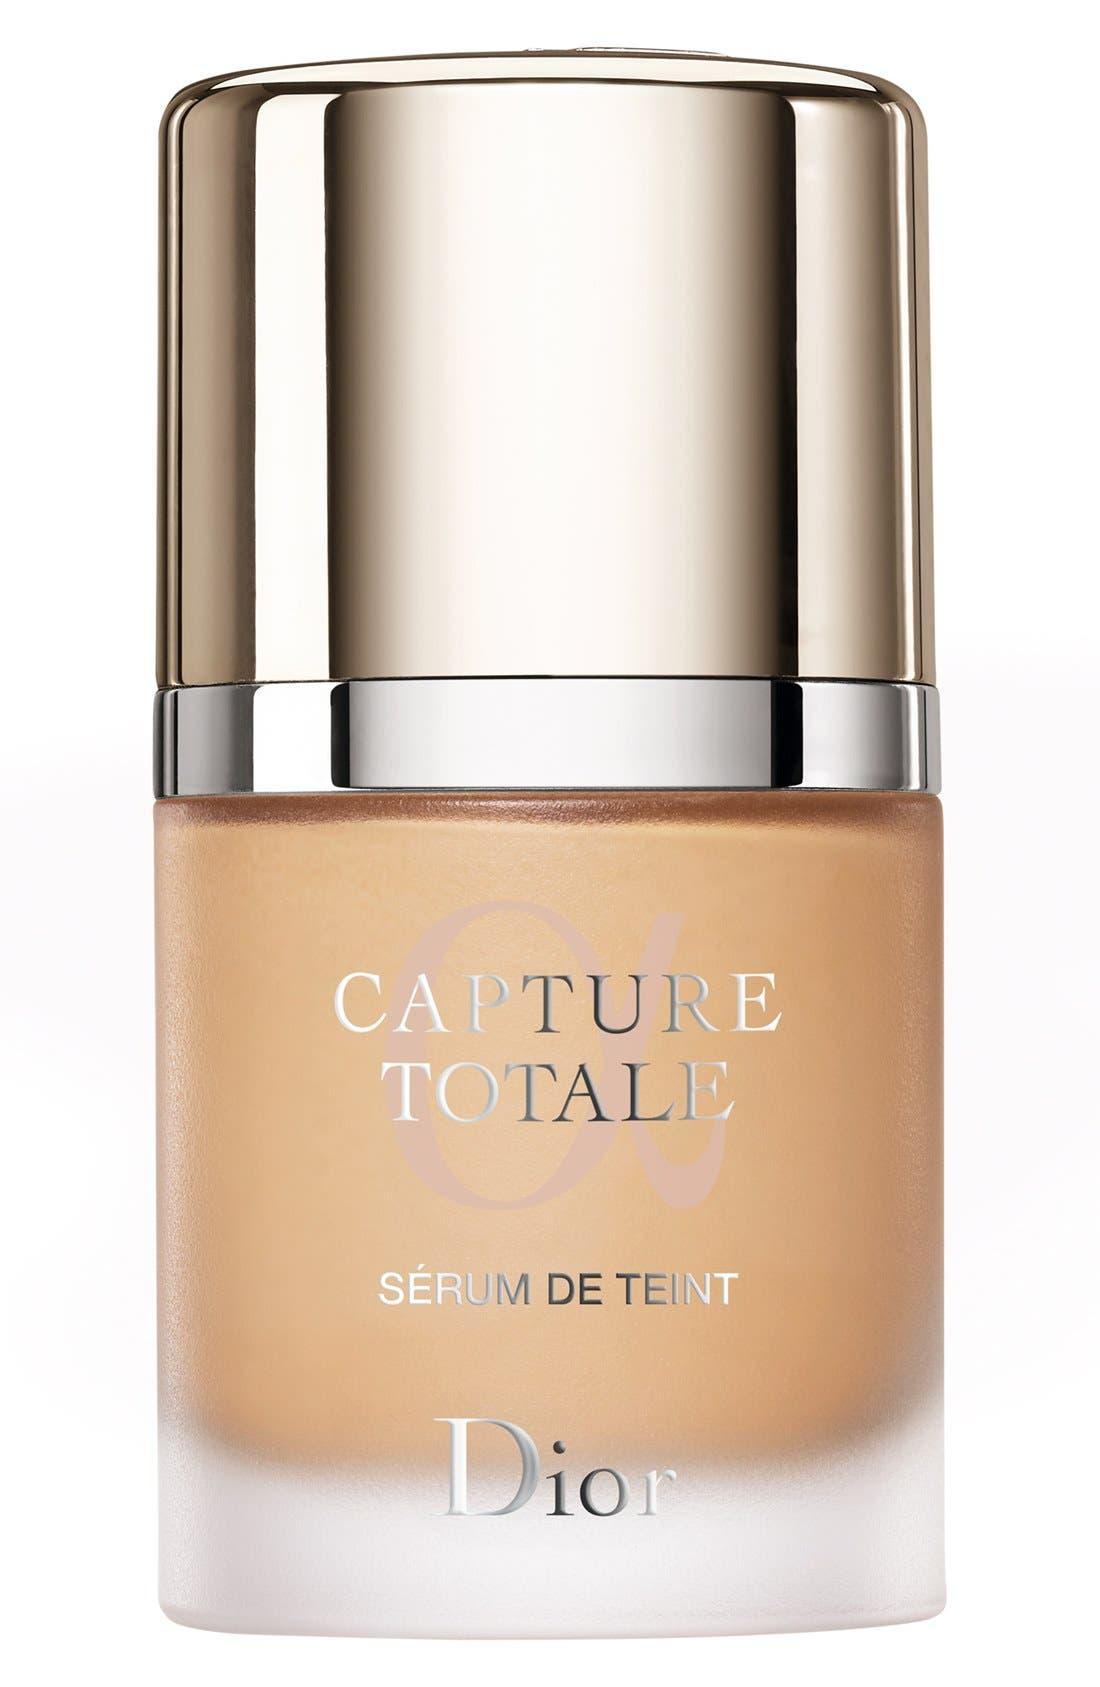 Dior Capture Totale Foundation Spf 25, oz - 031 Sand